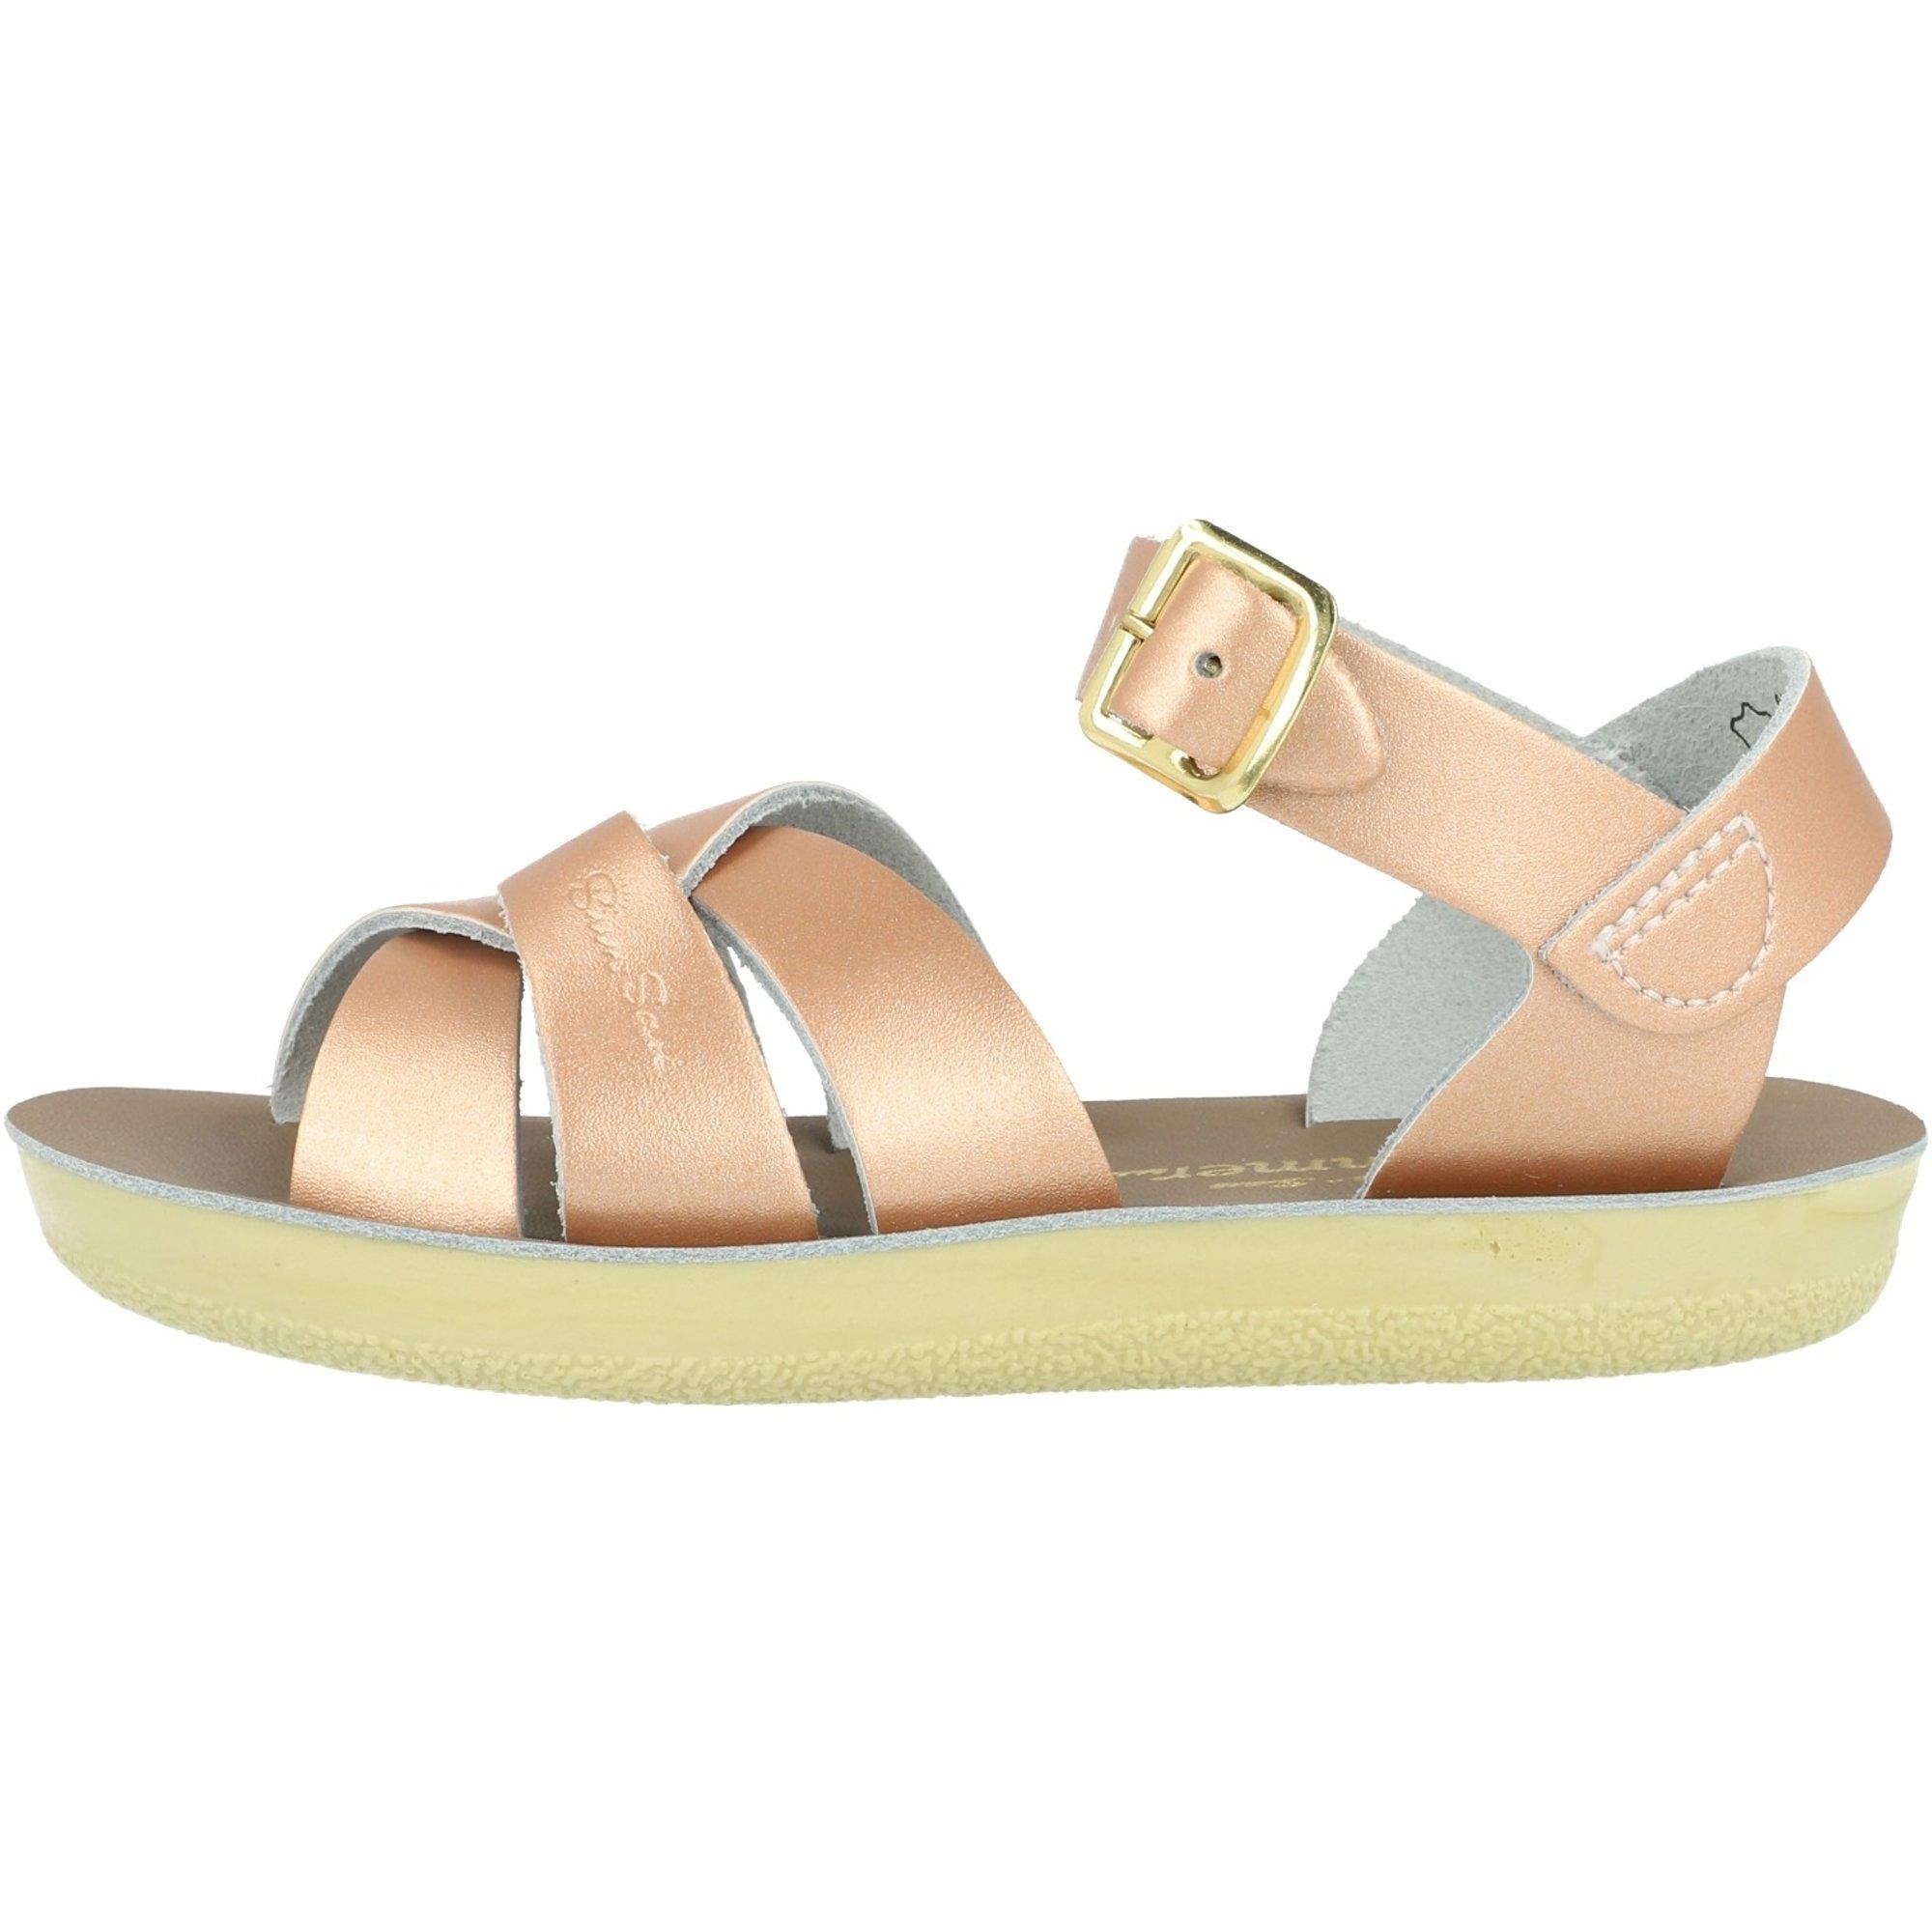 Salt Water Sandals Sun-San Swimmer Rose Gold Leather